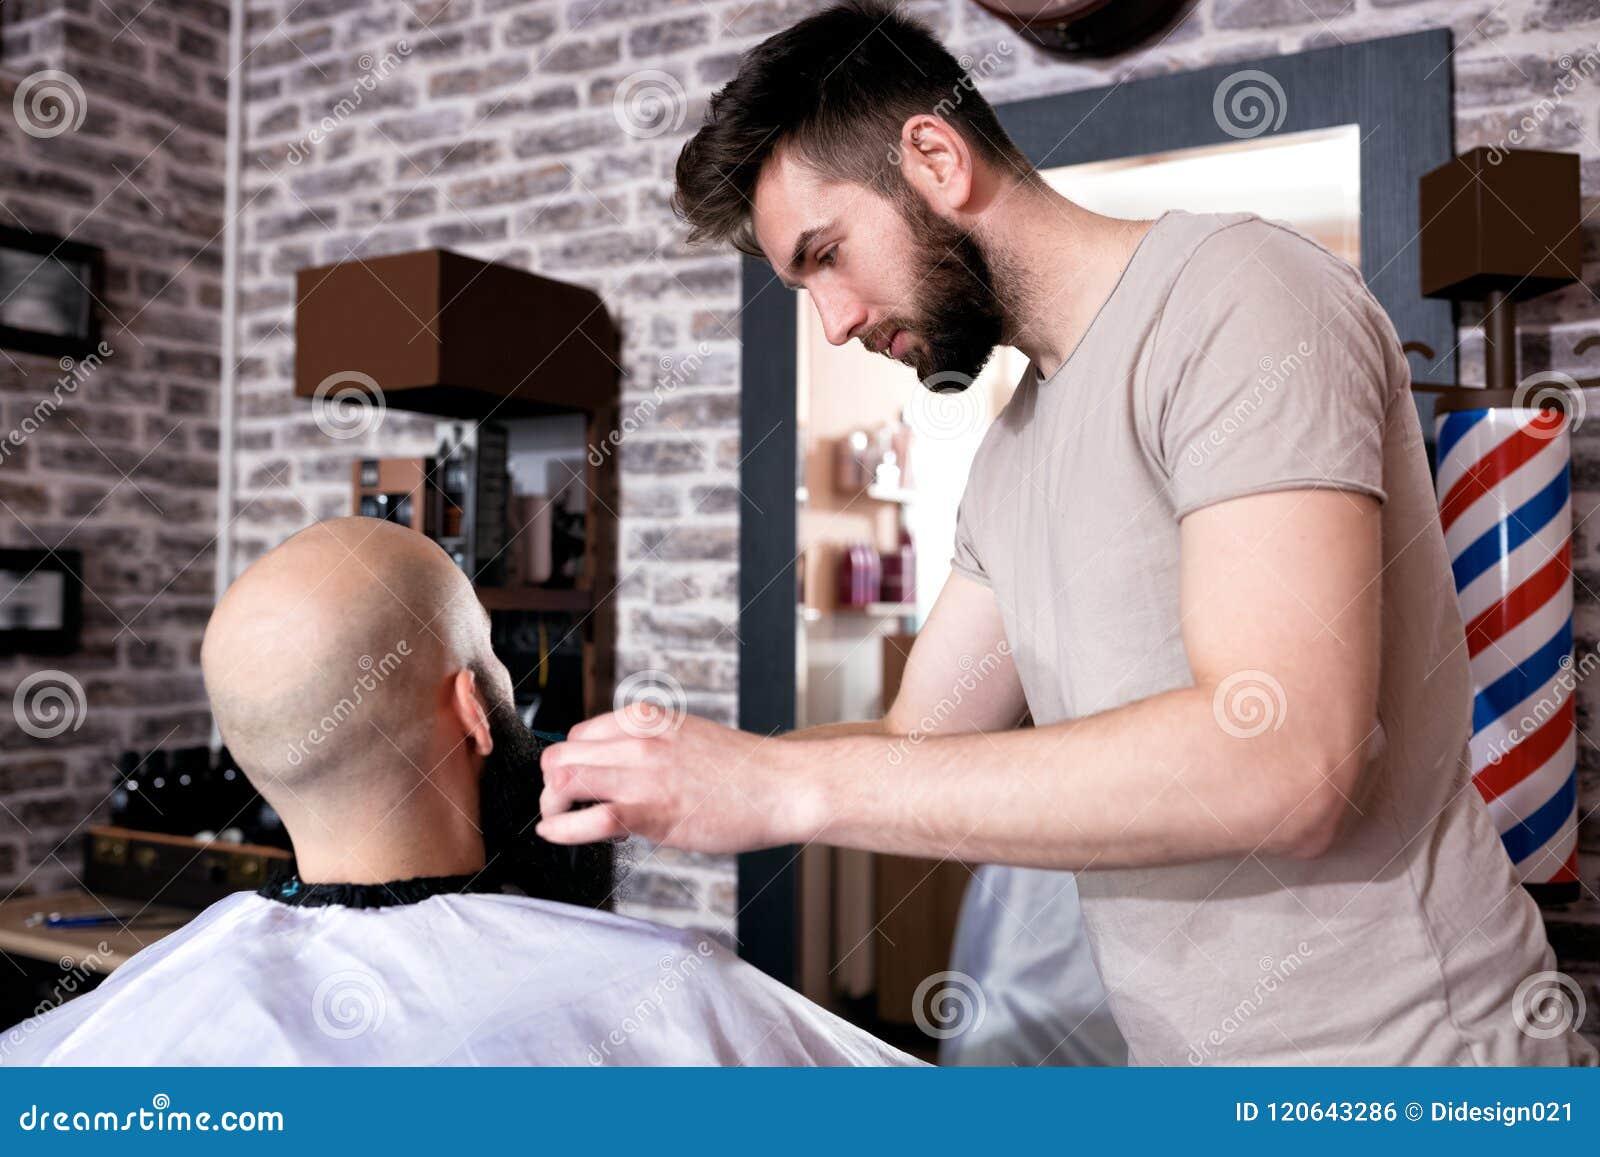 Professional Master hairdresser cuts client beard